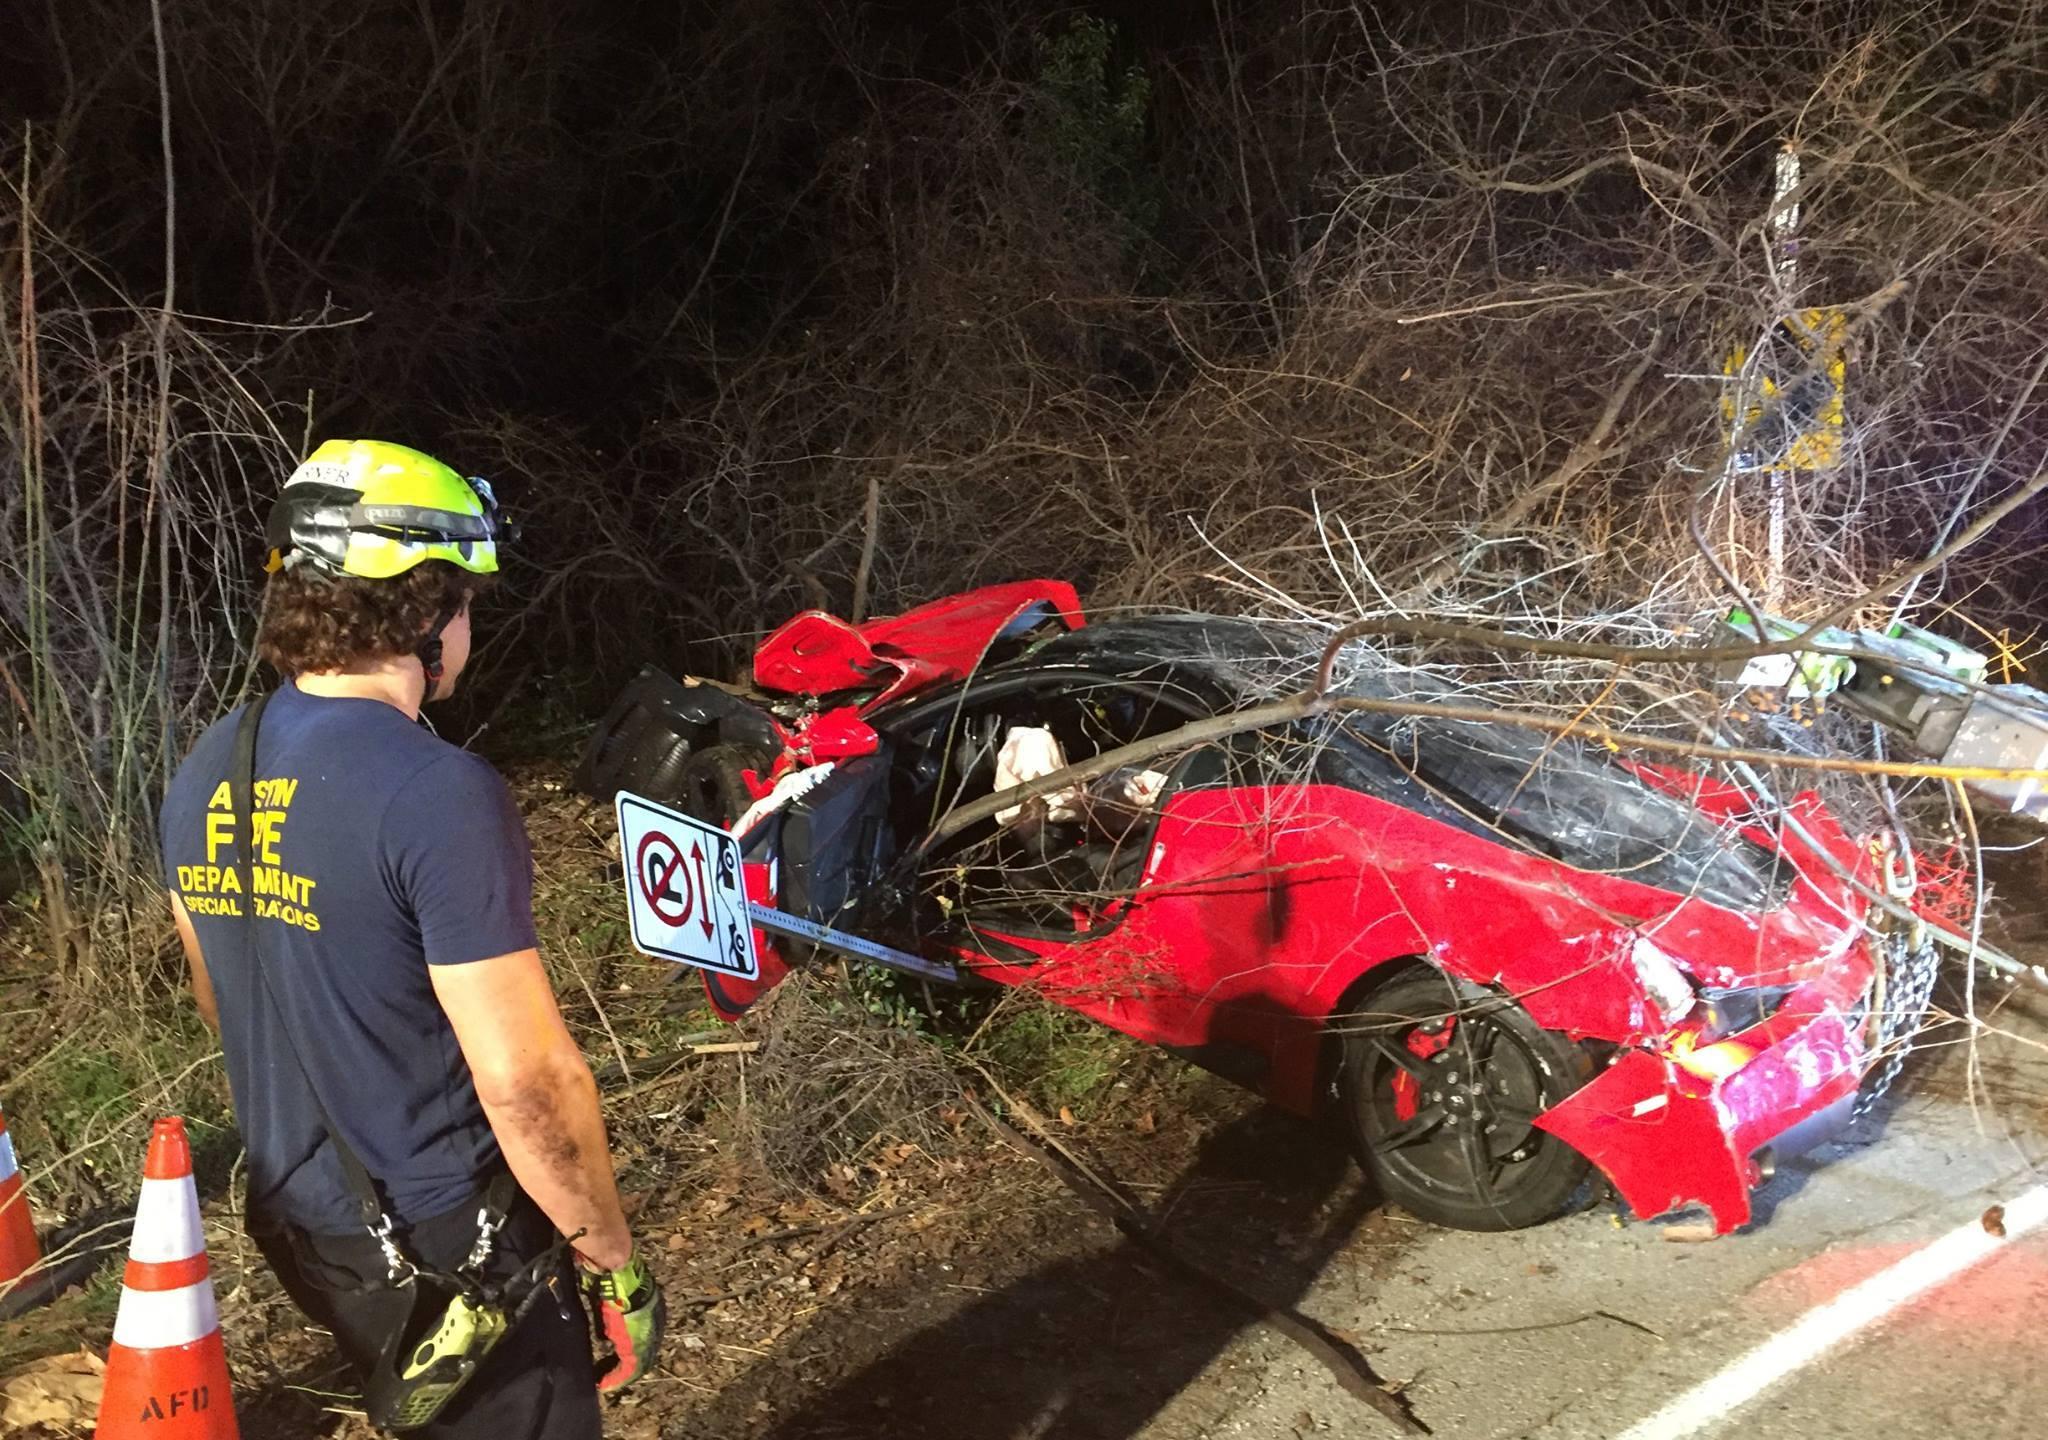 385k Ferrari Totaled After Crashing Into West Austin Ravine